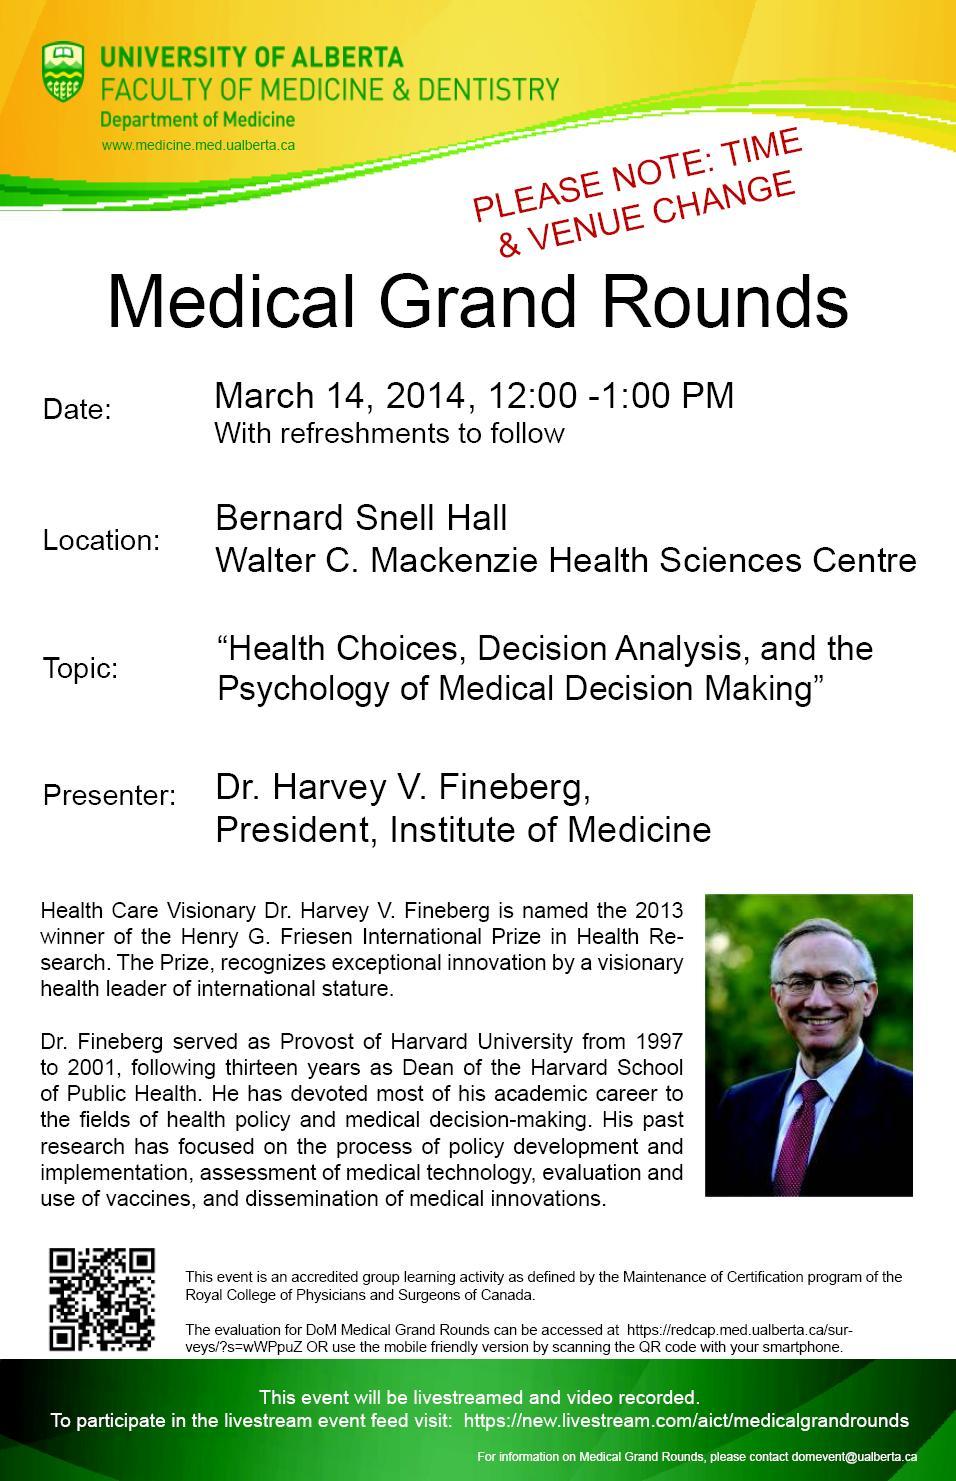 U Alberta Medical Grand Rounds - Fineberg - March 14, 2014